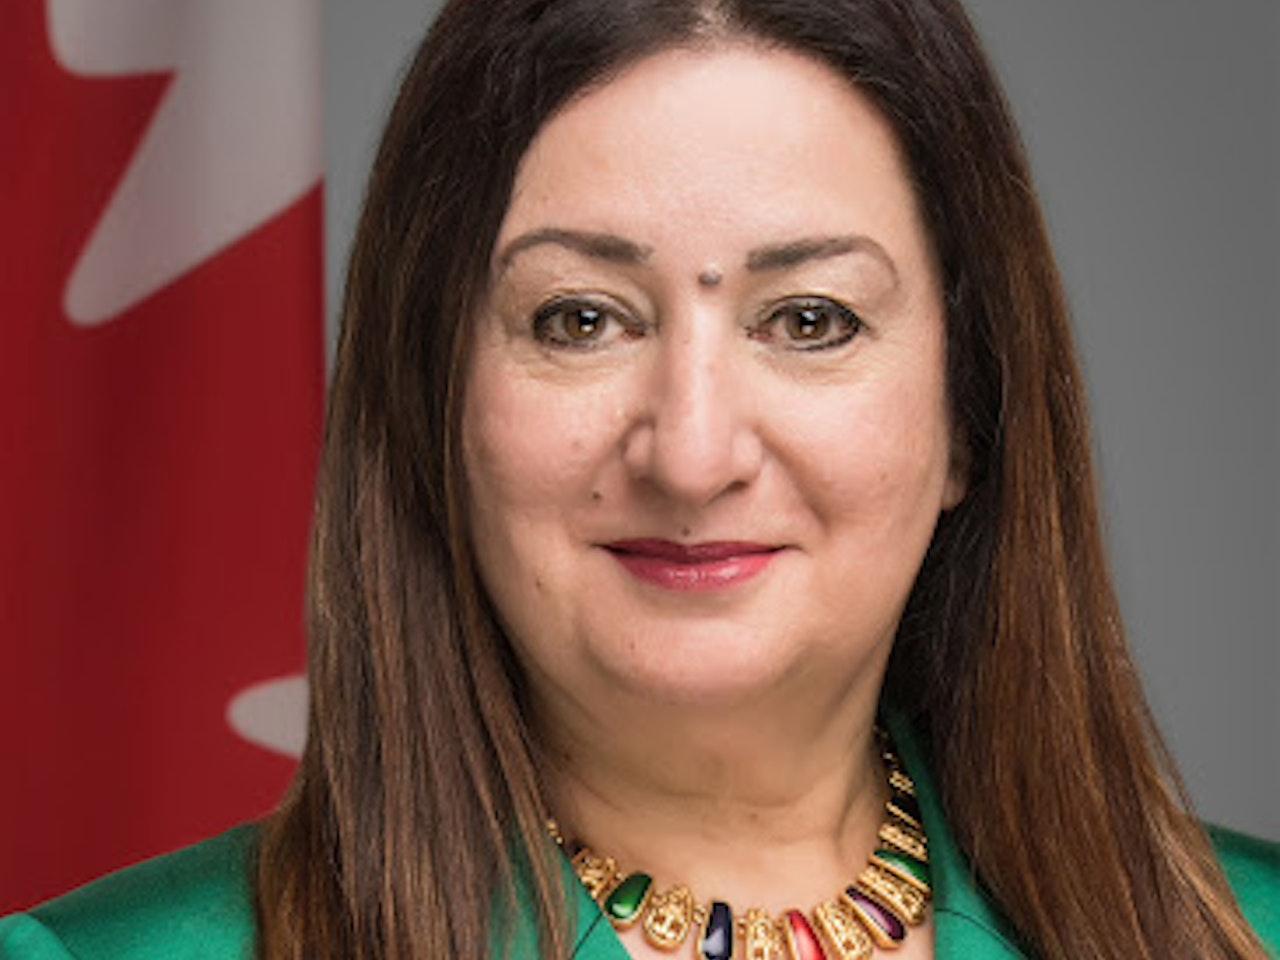 "Season 1 - ""Great Canadians"" Series - Hon. Senator Salma Ataullahjan Interview / Entrevue ""Canadiens Exceptionnels"" avec l'Hon. Sénatrice Salma Ataullahjan"